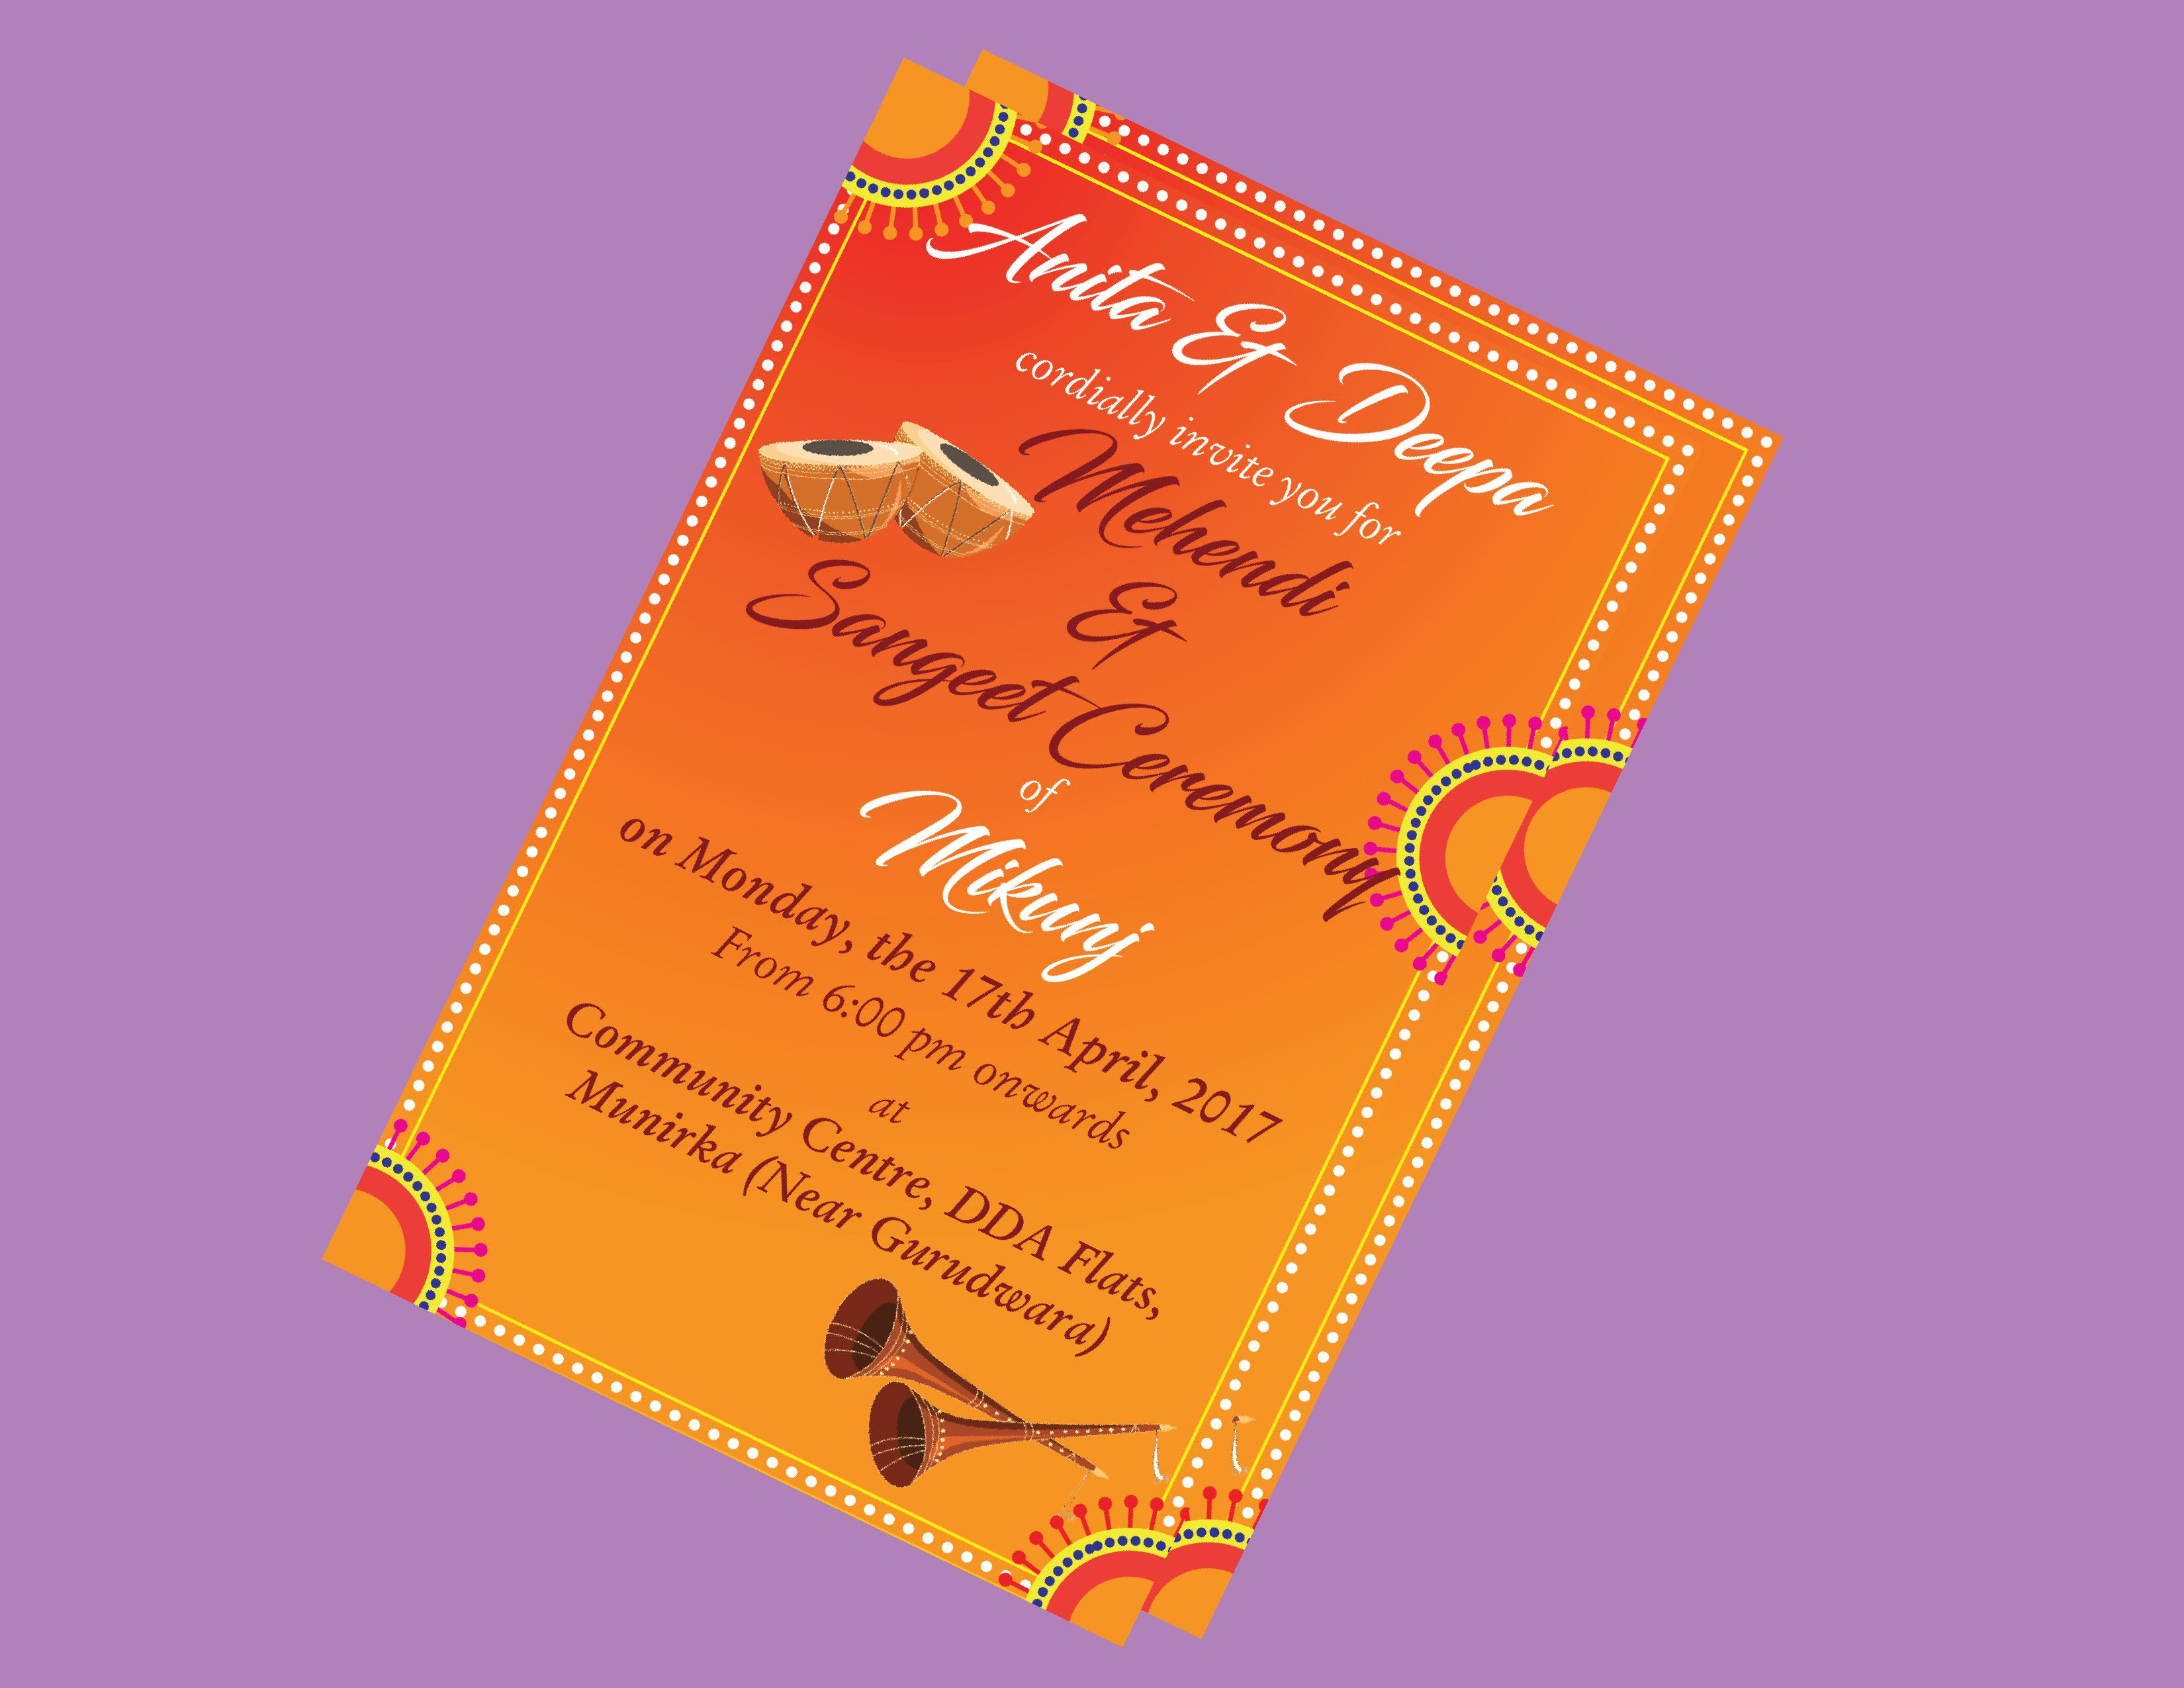 #Mehendi #Ladies Sangeet #Sangeet #invitation #Card #Groom #Night #fun #festive #dance #music #love #night #timetoclebrate #goodtimes #family #Adobeillustrator #colorful #night #nighttoremember